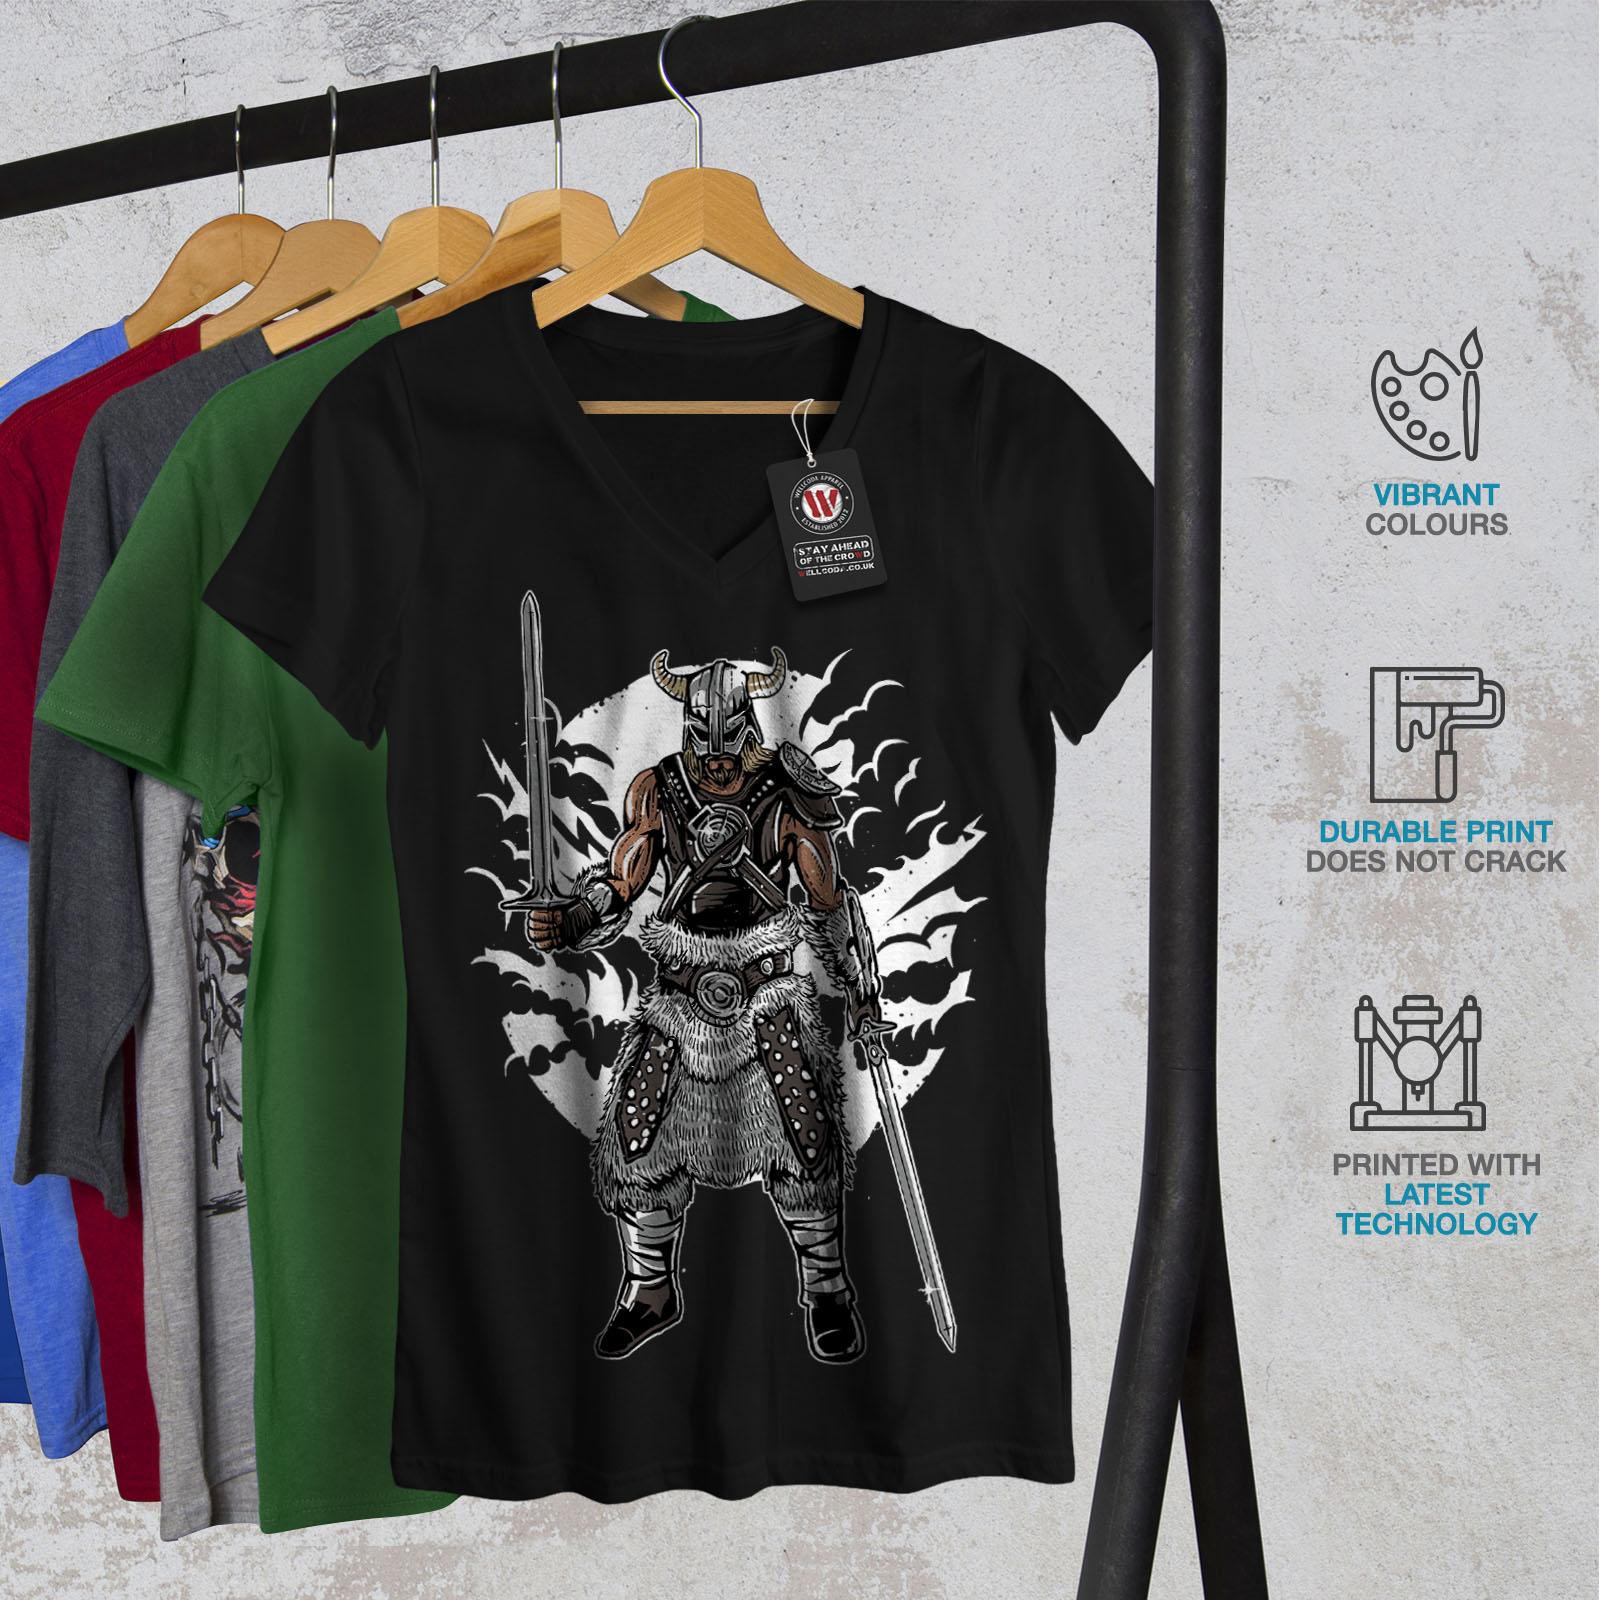 Viking-Warrior-Fashion-Women-V-Neck-T-shirt-NEW-Wellcoda miniatuur 4